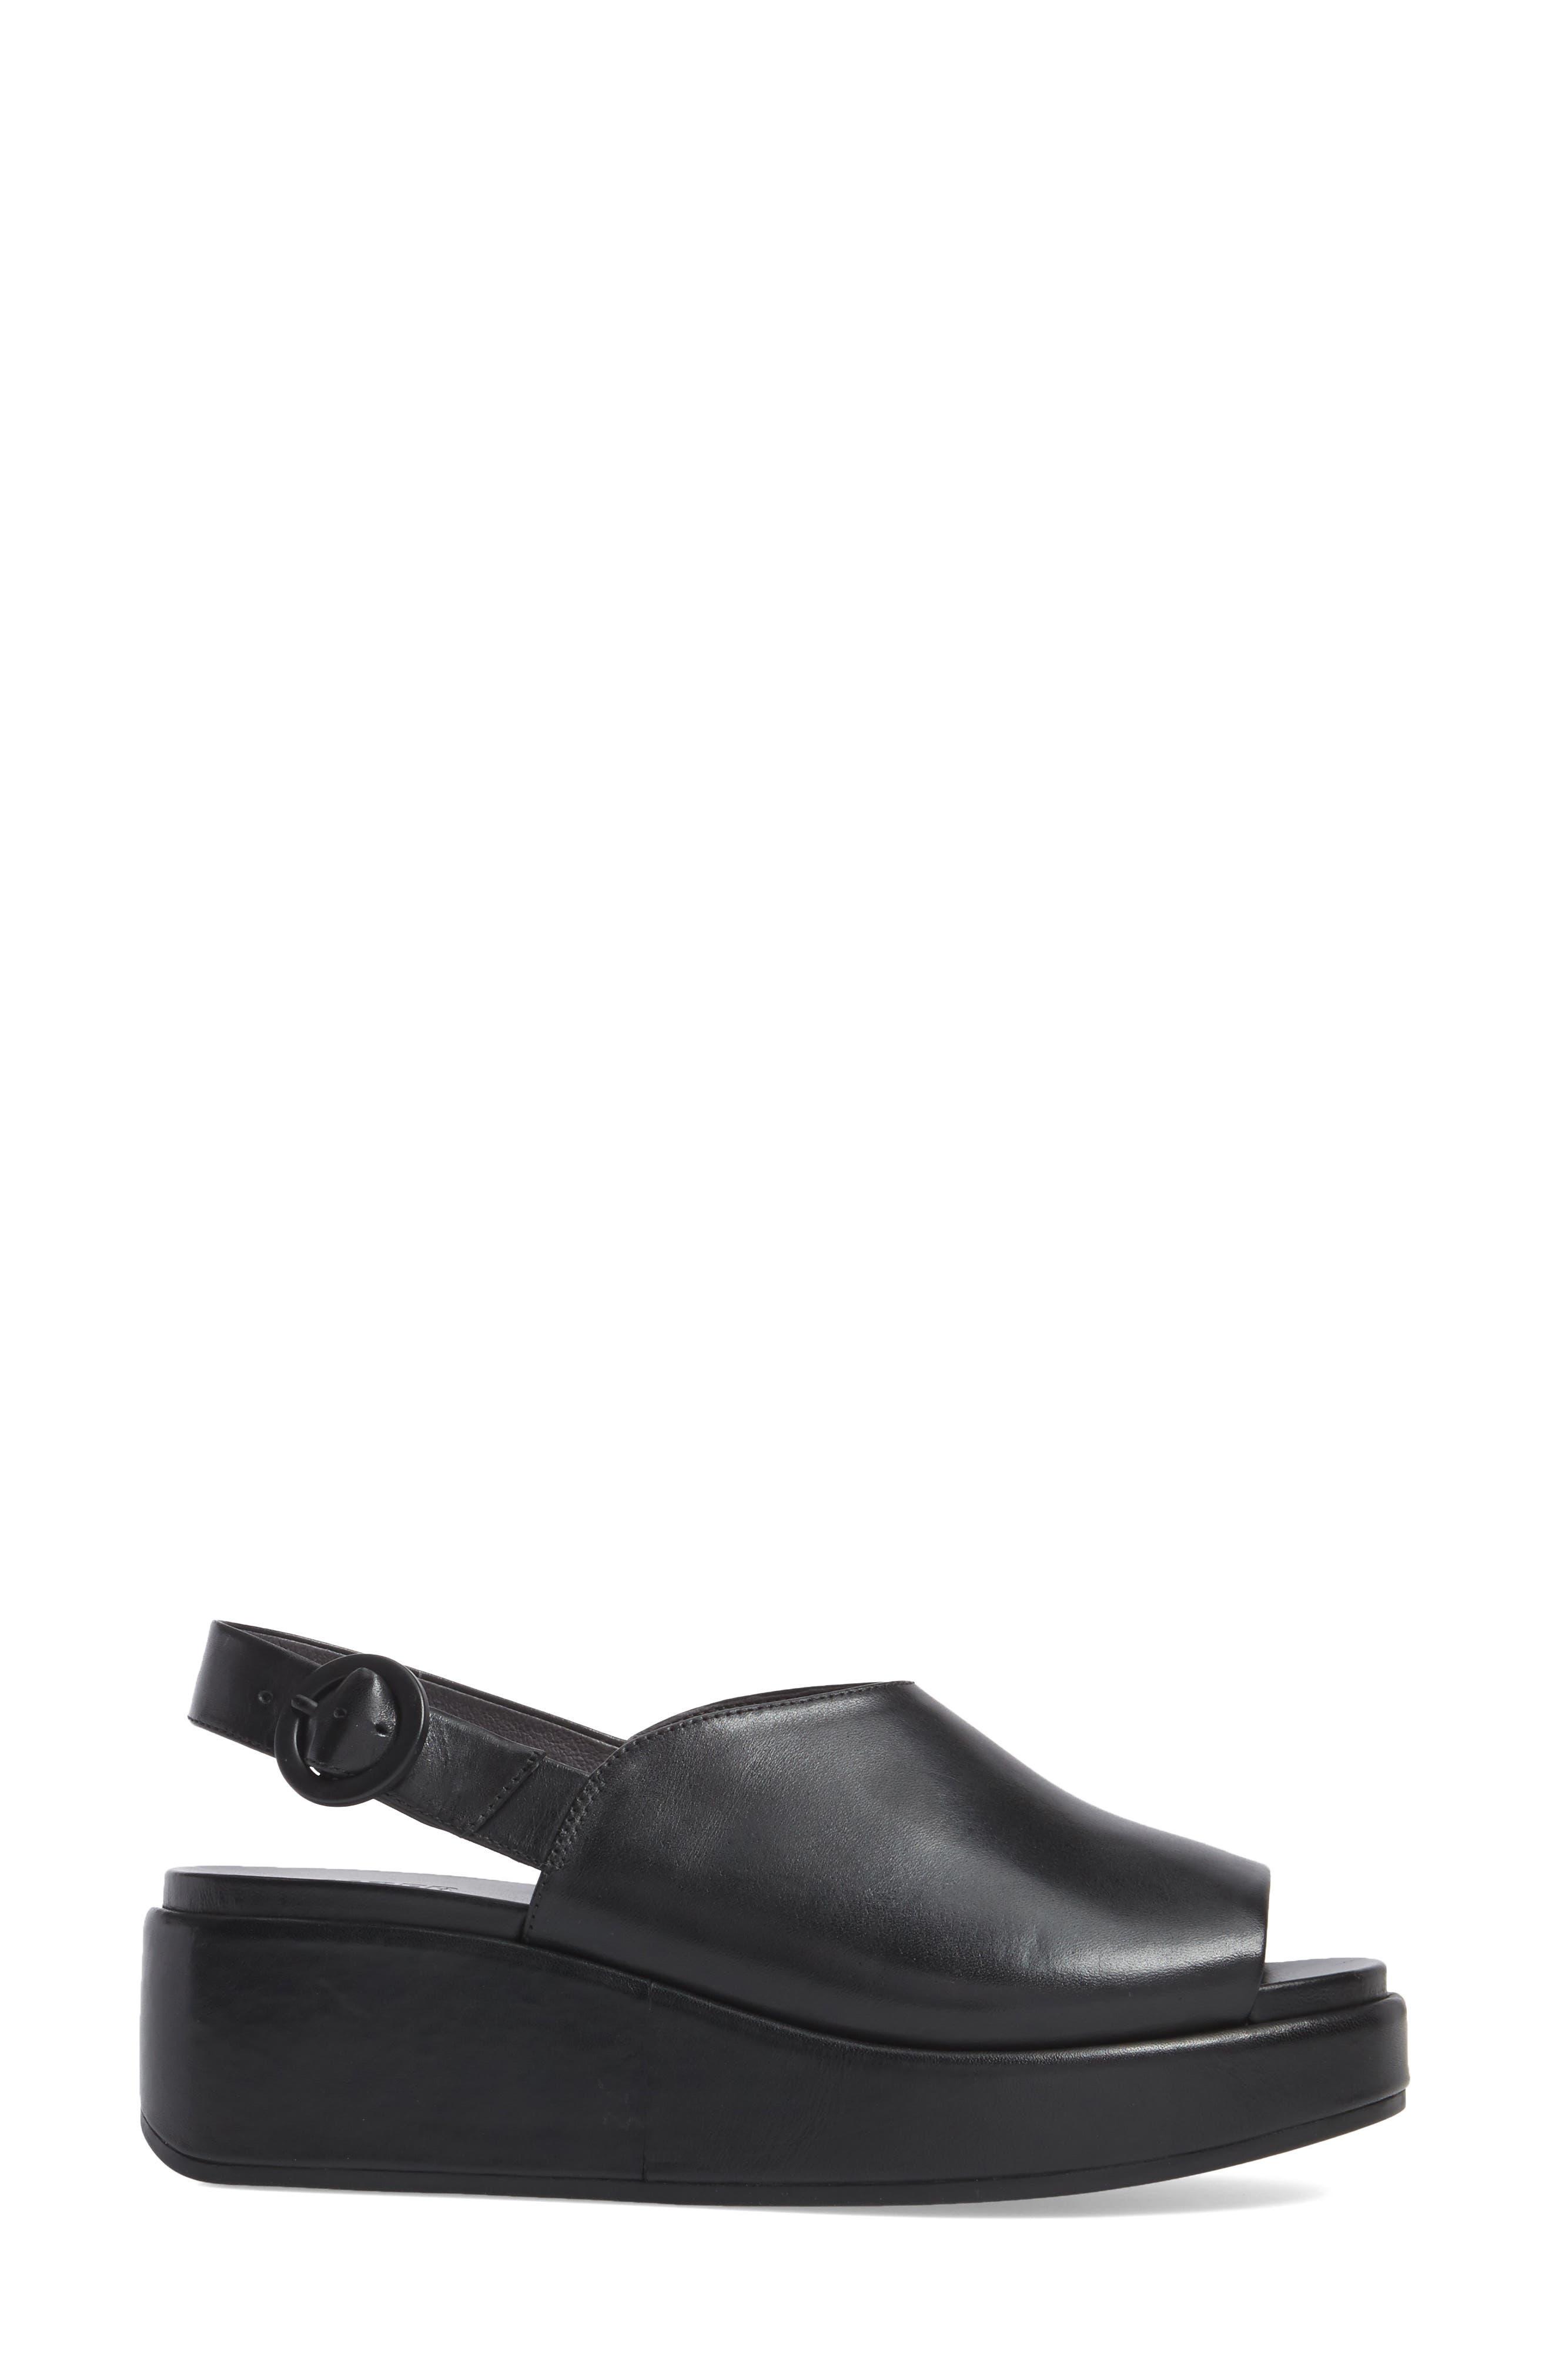 Misia Slingback Platform Wedge Sandal,                             Alternate thumbnail 3, color,                             BLACK LEATHER